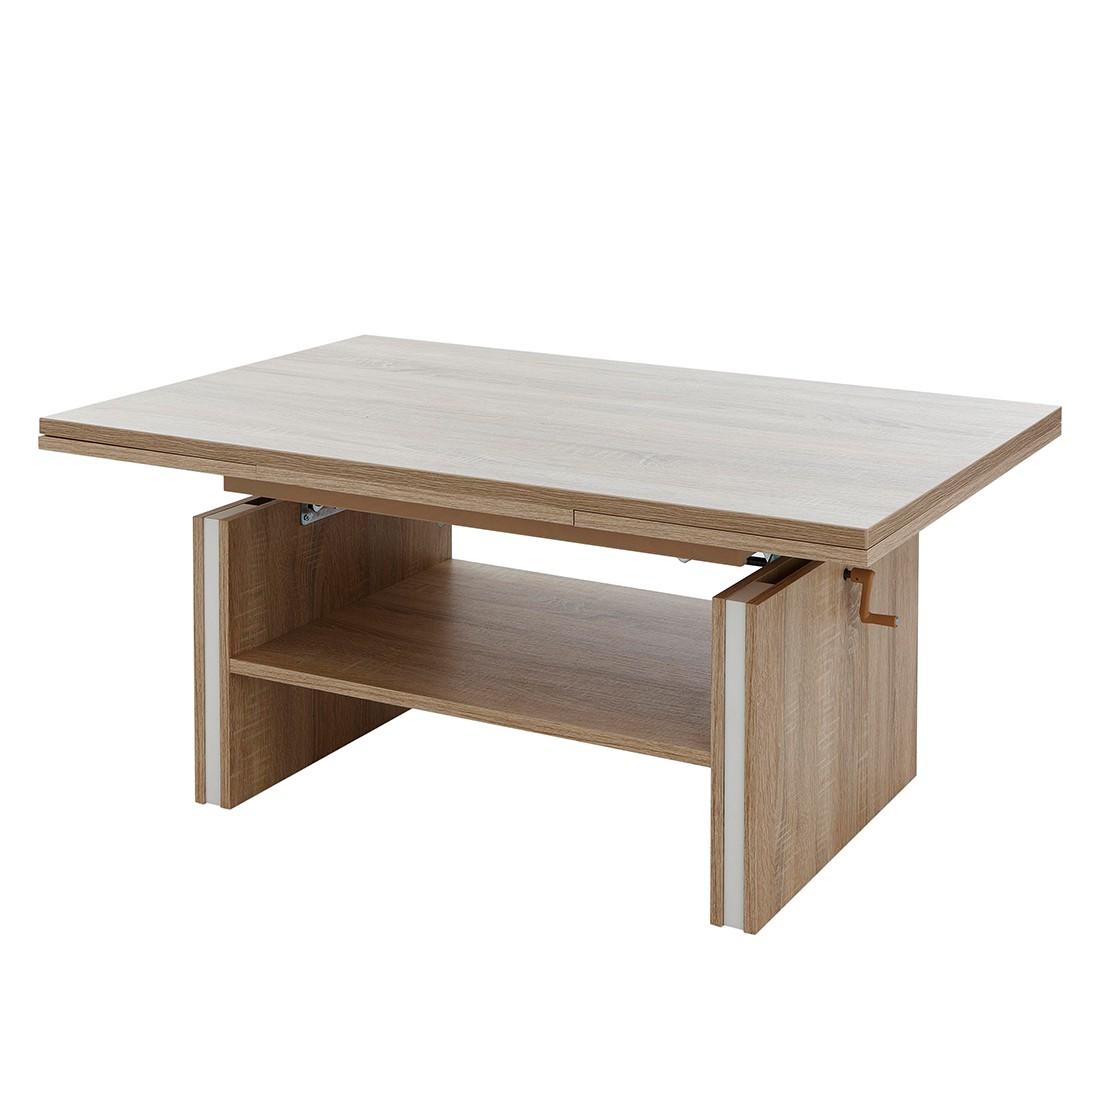 Table basse Panadura - Chêne de Sonoma, Modoform